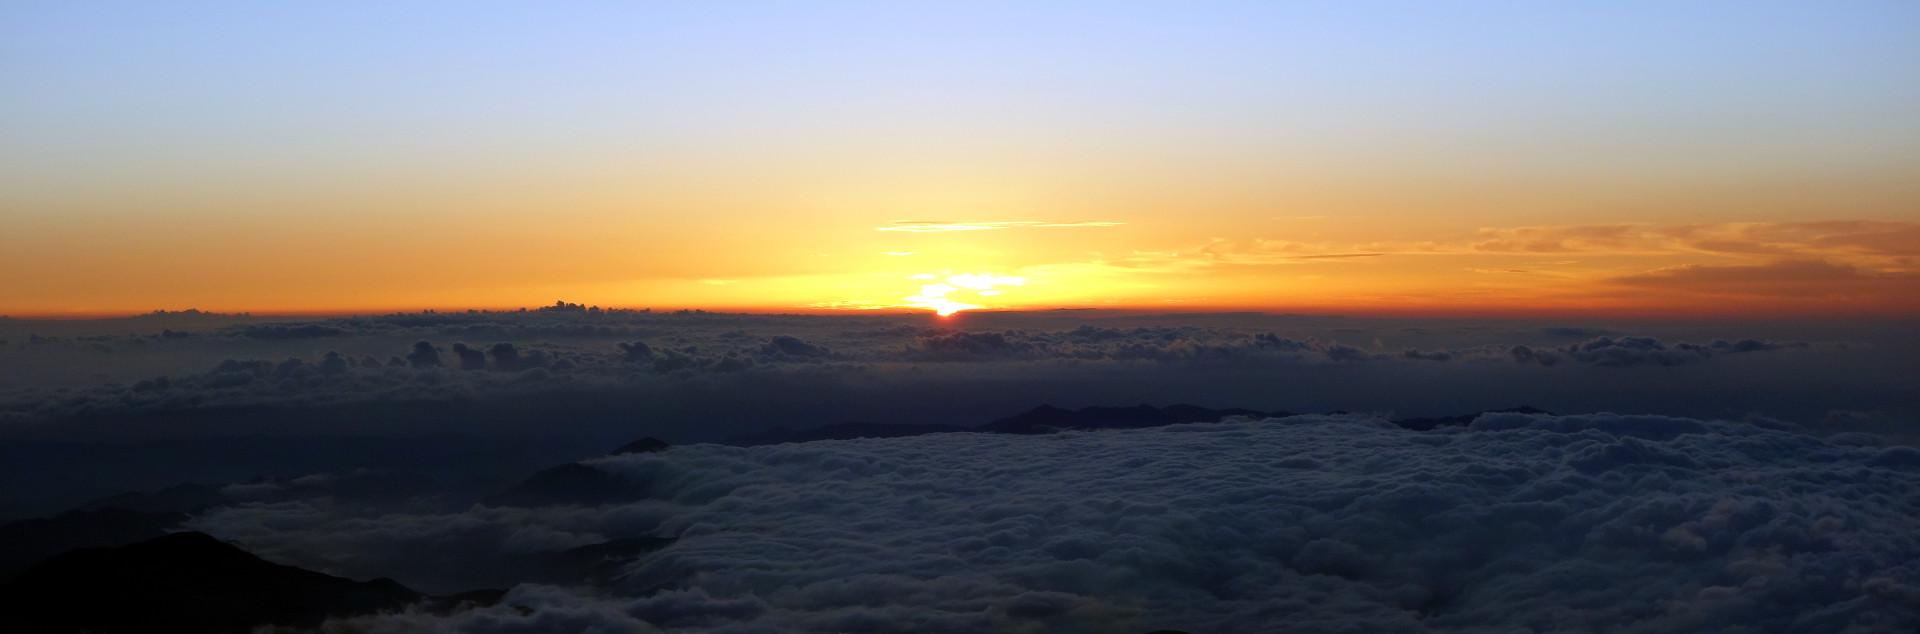 20140806 220756 fujisan sunrise